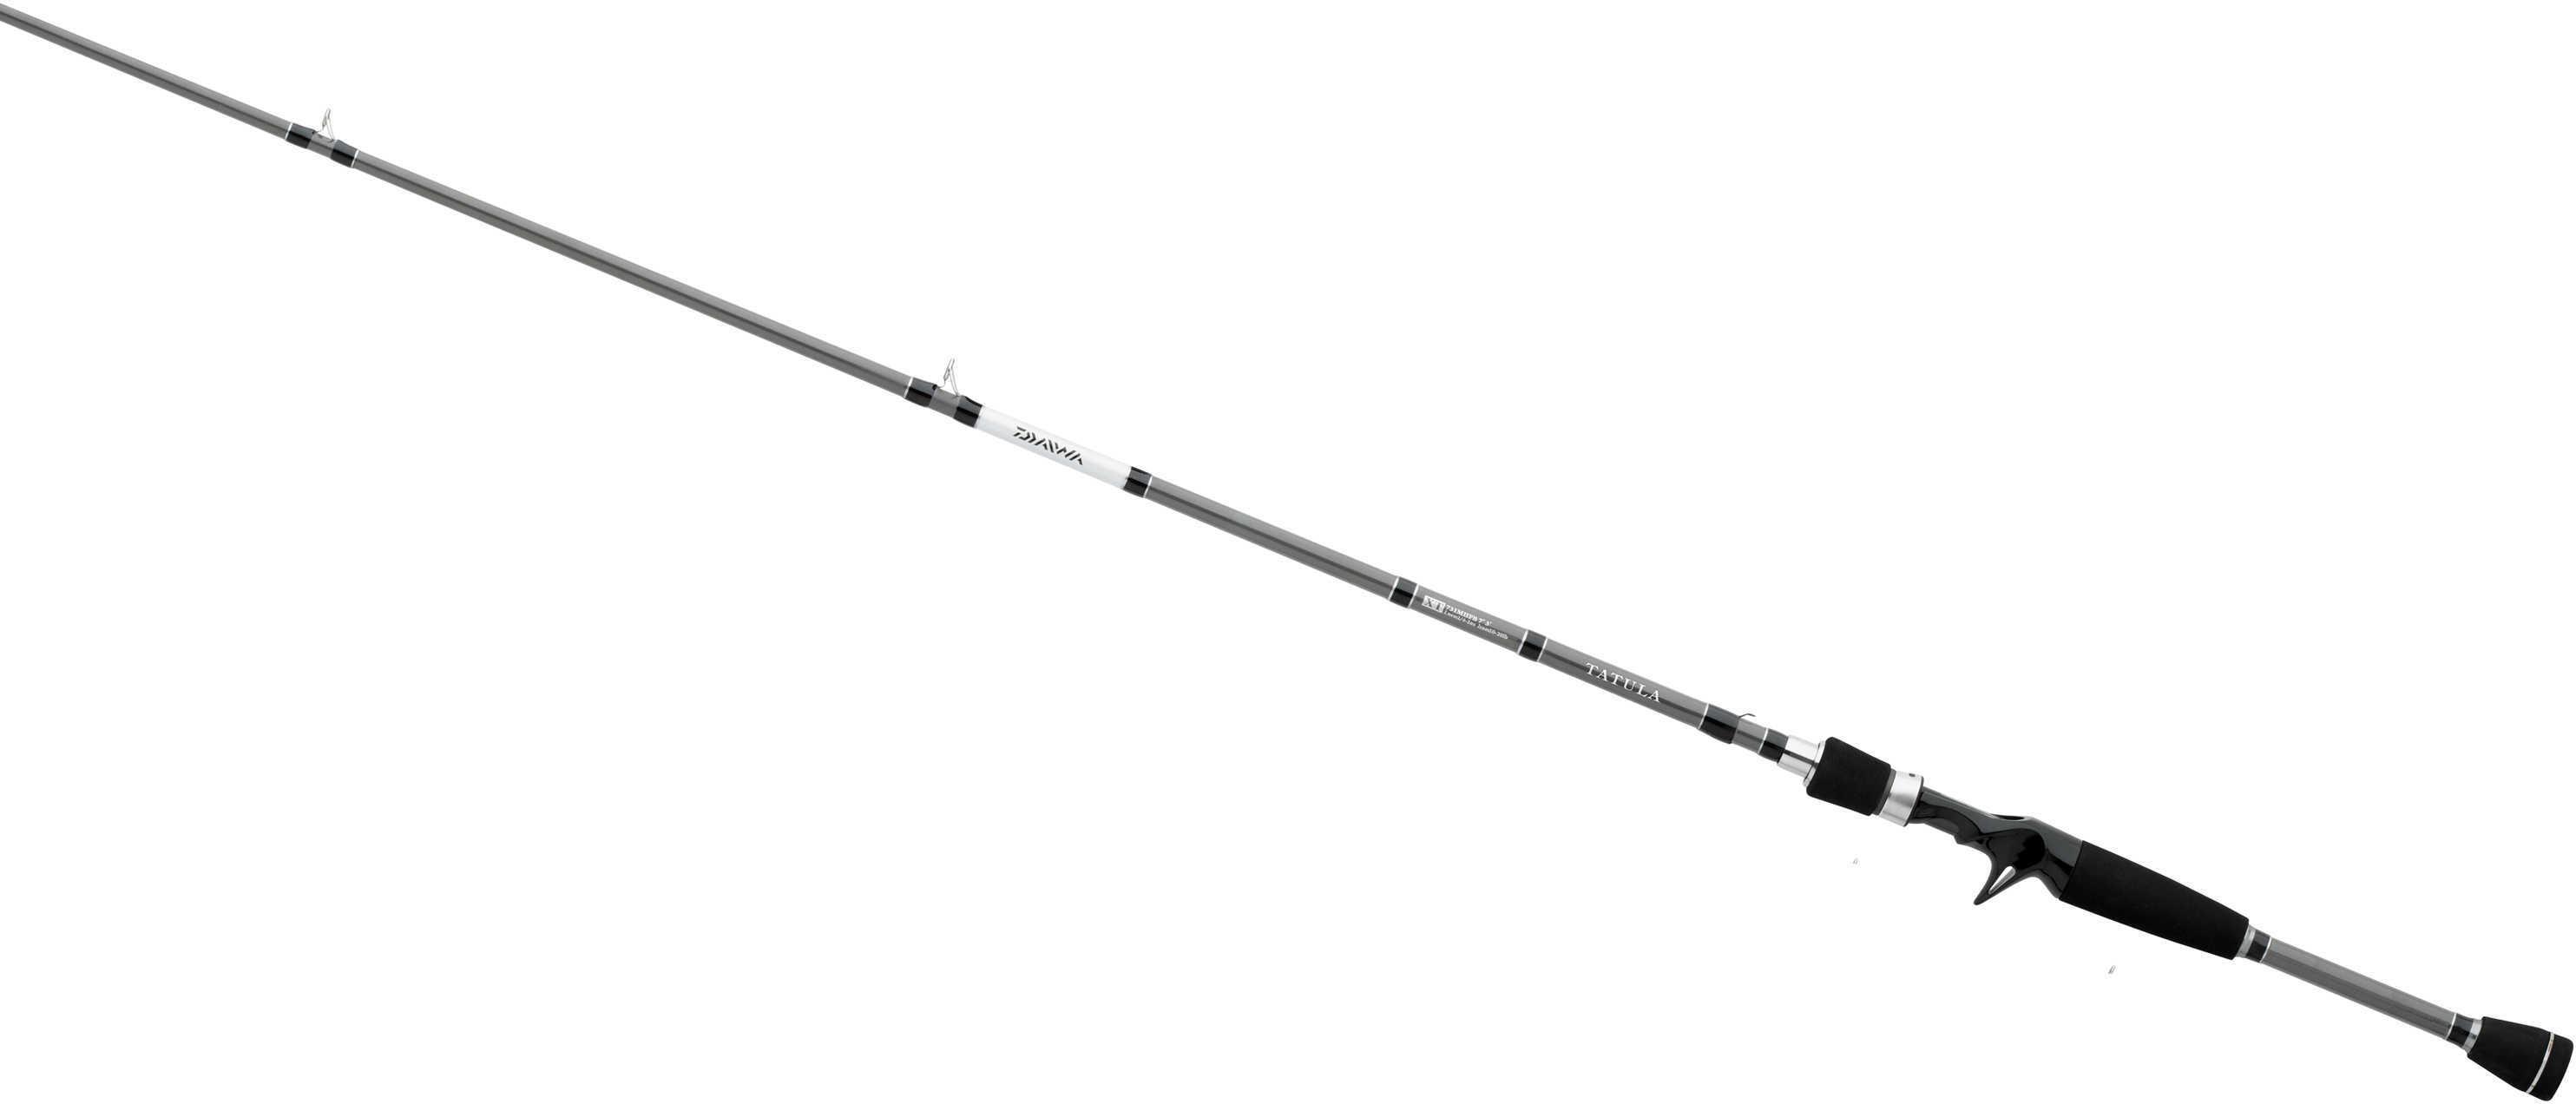 "Daiwa Tatula XT Bass Casting Rod 7'1"" Length, 1 Piece Rod, Medium/Heavy Power, Extra Fast Action Md: TXT71"